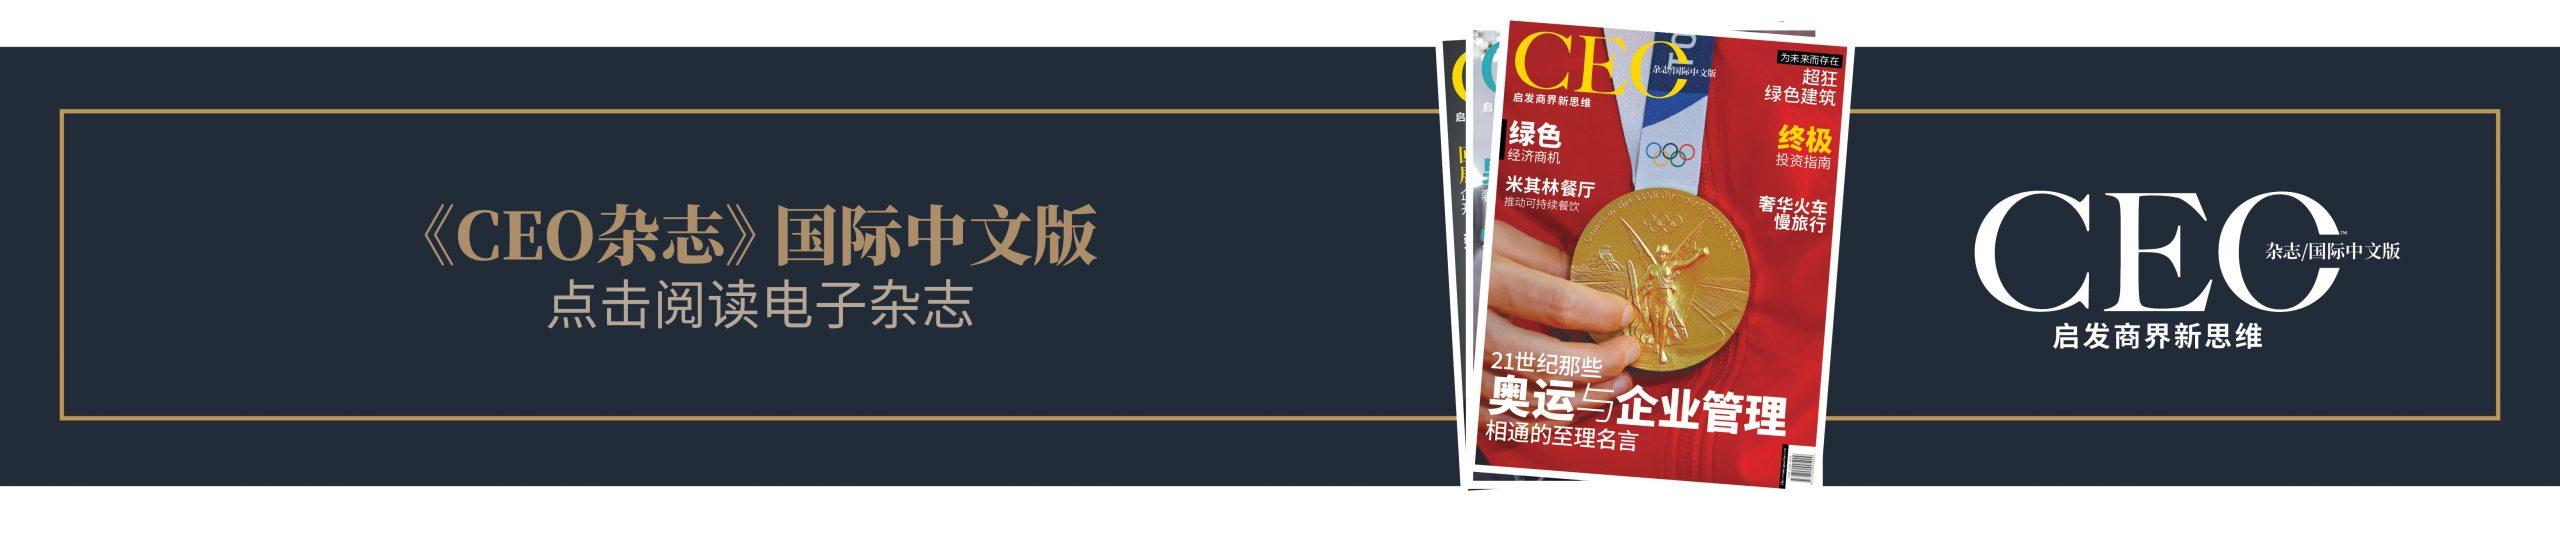 Download Digital Magazine